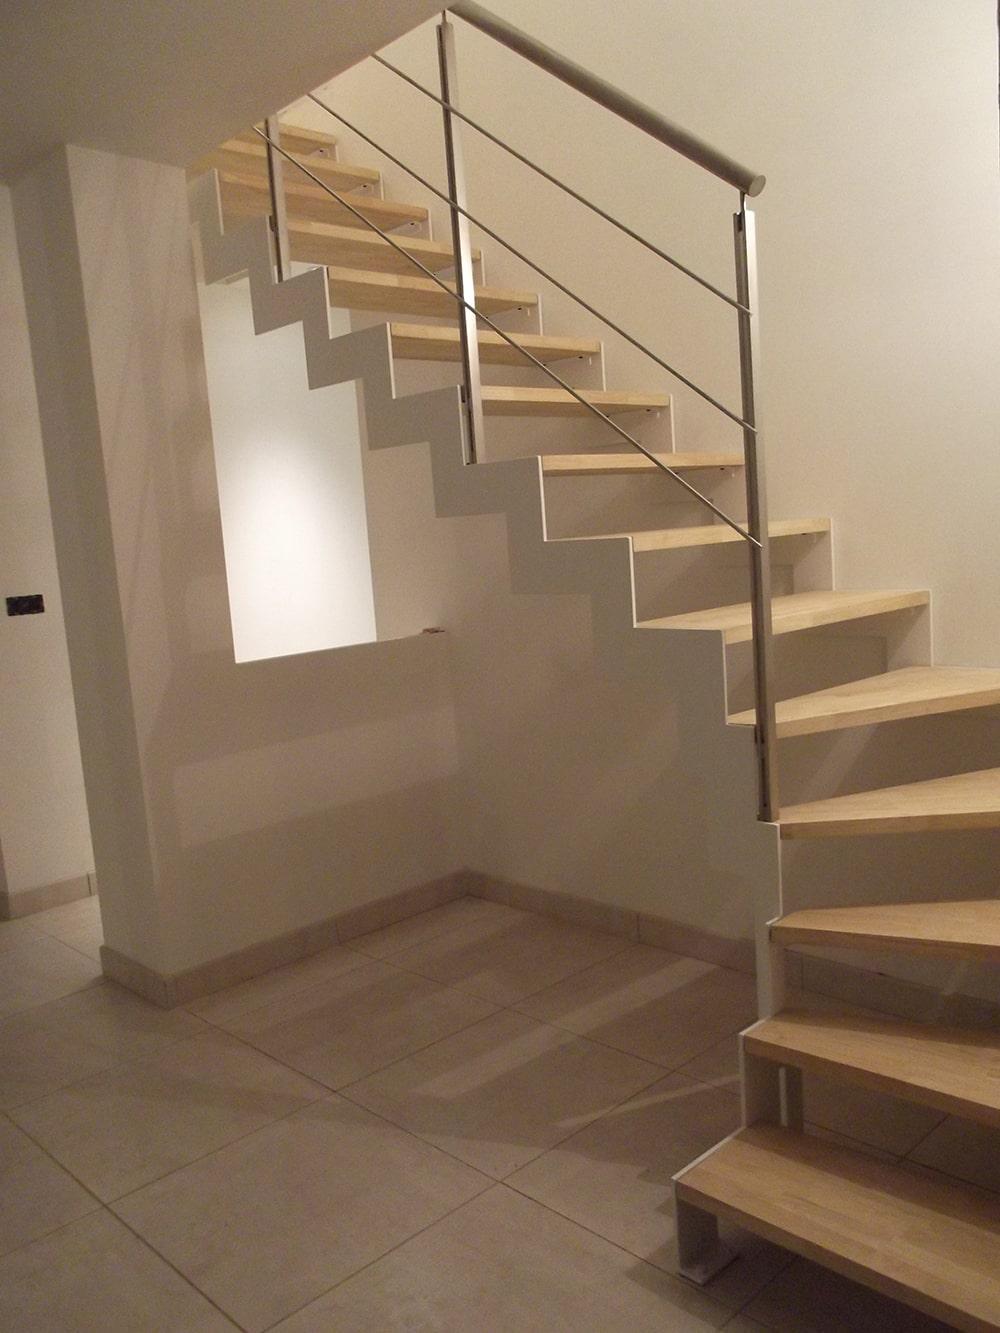 Escalier quart tournant avec garde-corps en inox